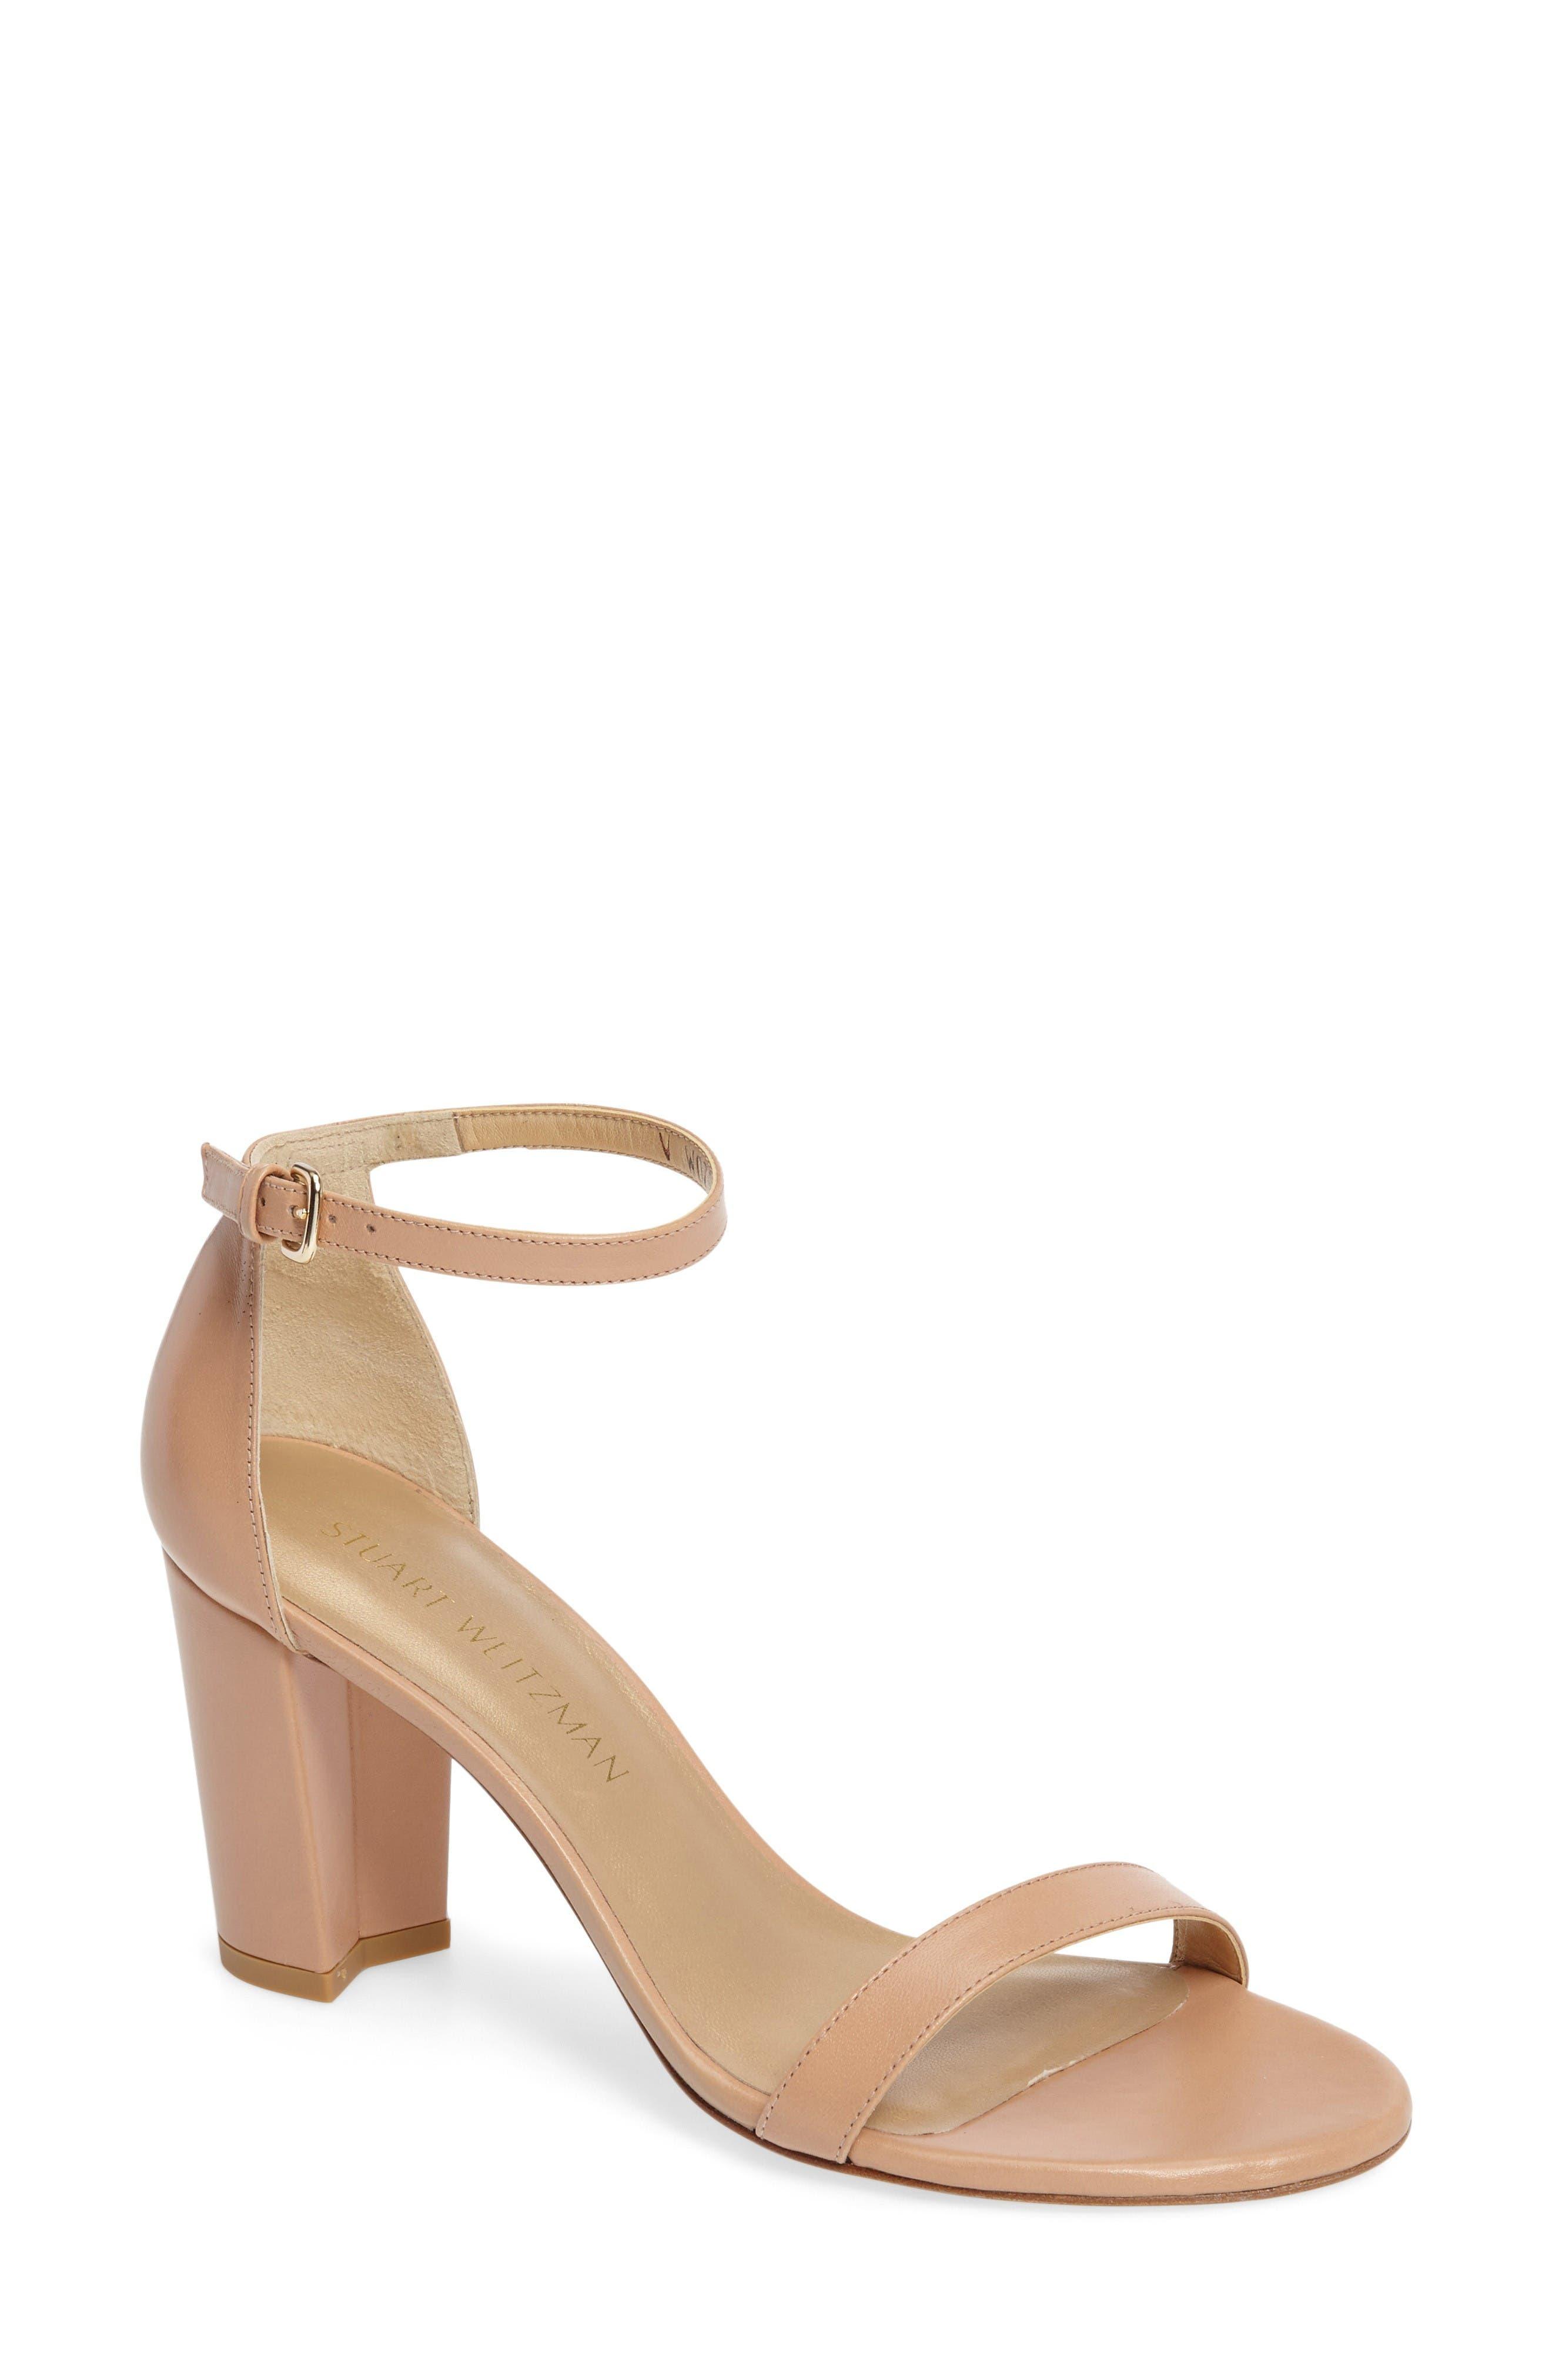 Main Image - Stuart Weitzman NearlyNude Ankle Strap Sandal (Women)